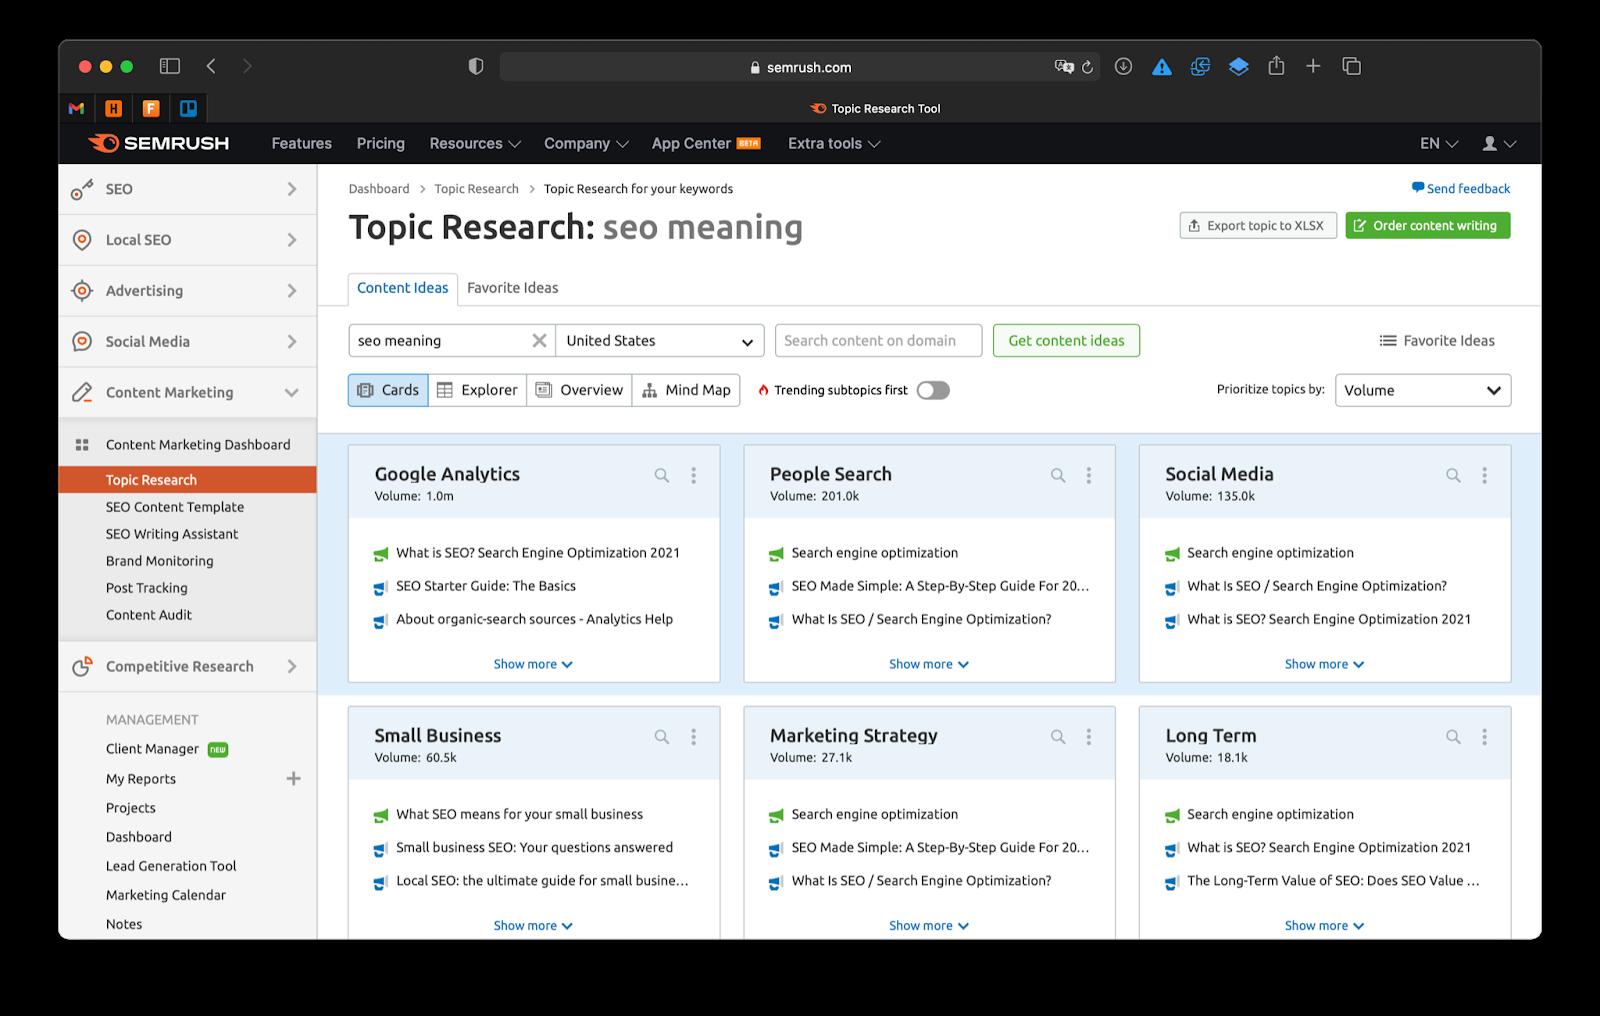 Screenshot of SEMrush view inside the Topic Research Tool.